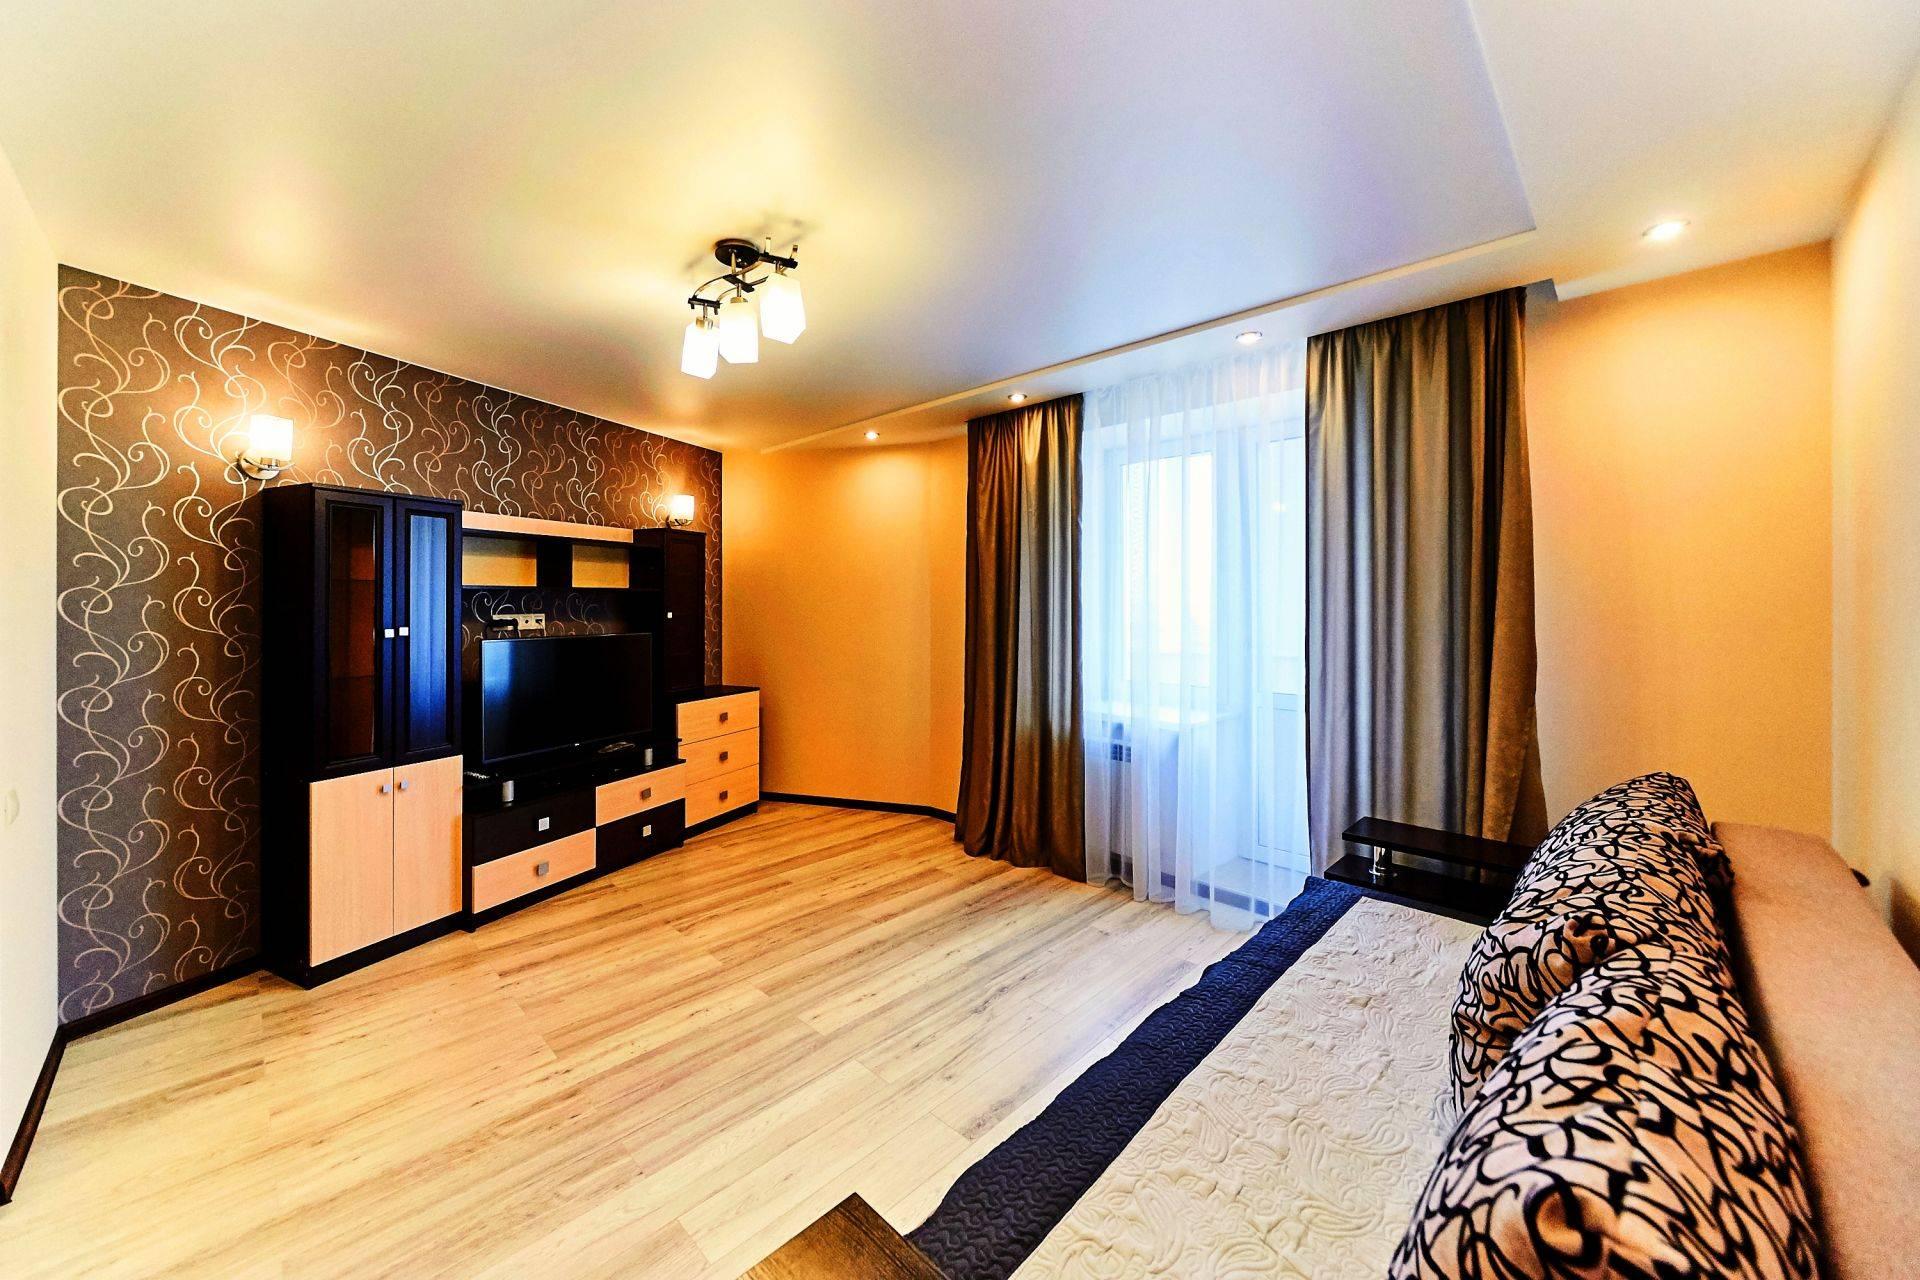 Снять трехкомнатную квартиру в турции - 12 объявлений, аренда трехкомнатных квартир в турции на move.ru